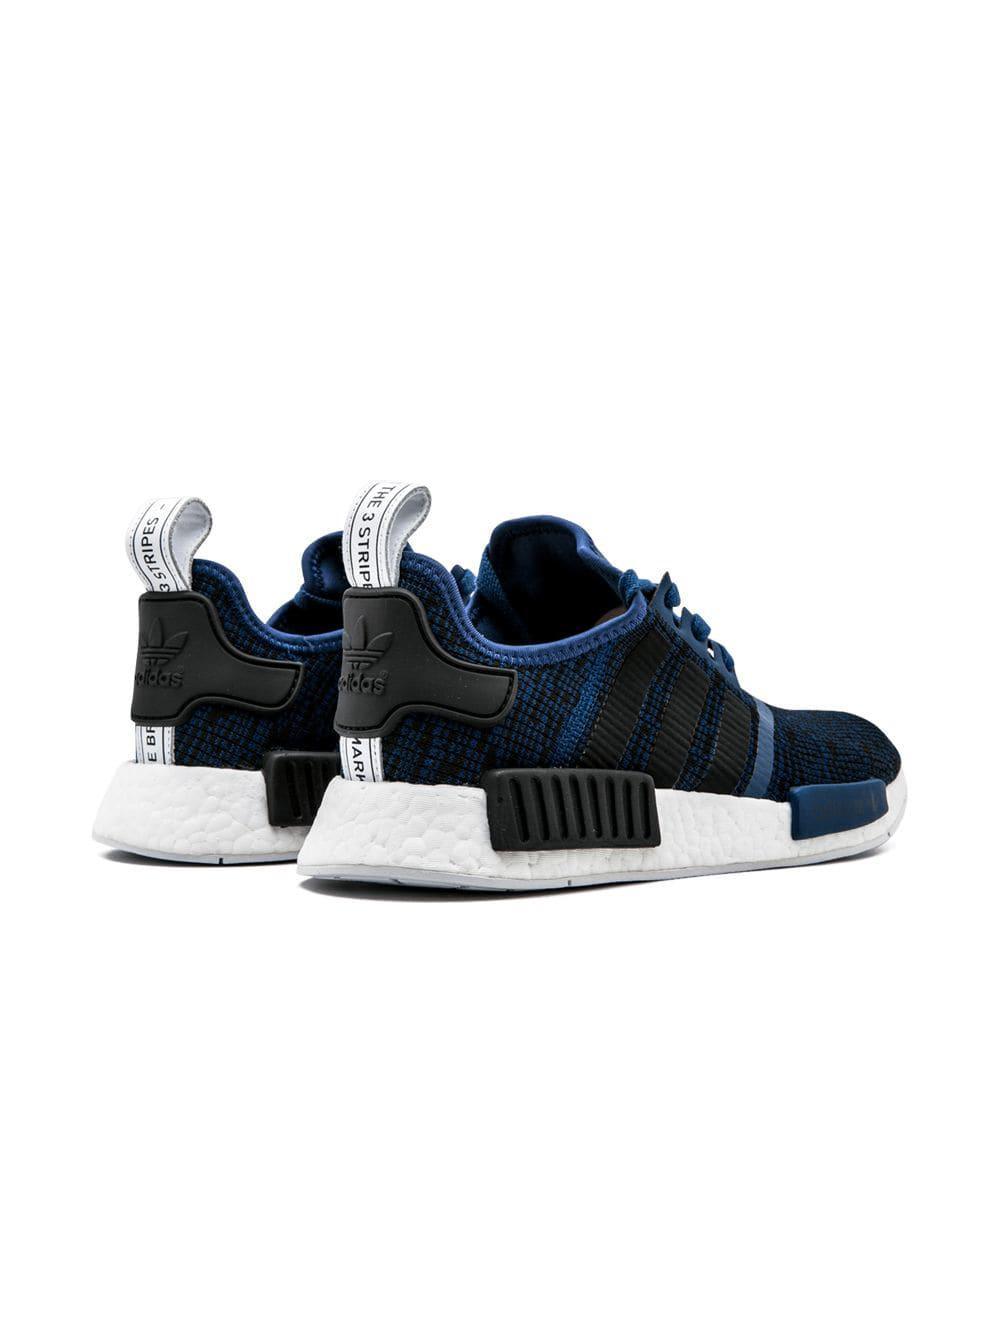 da00fc846587a Lyst - adidas Originals Nmd r1 Sneakers in Blue for Men